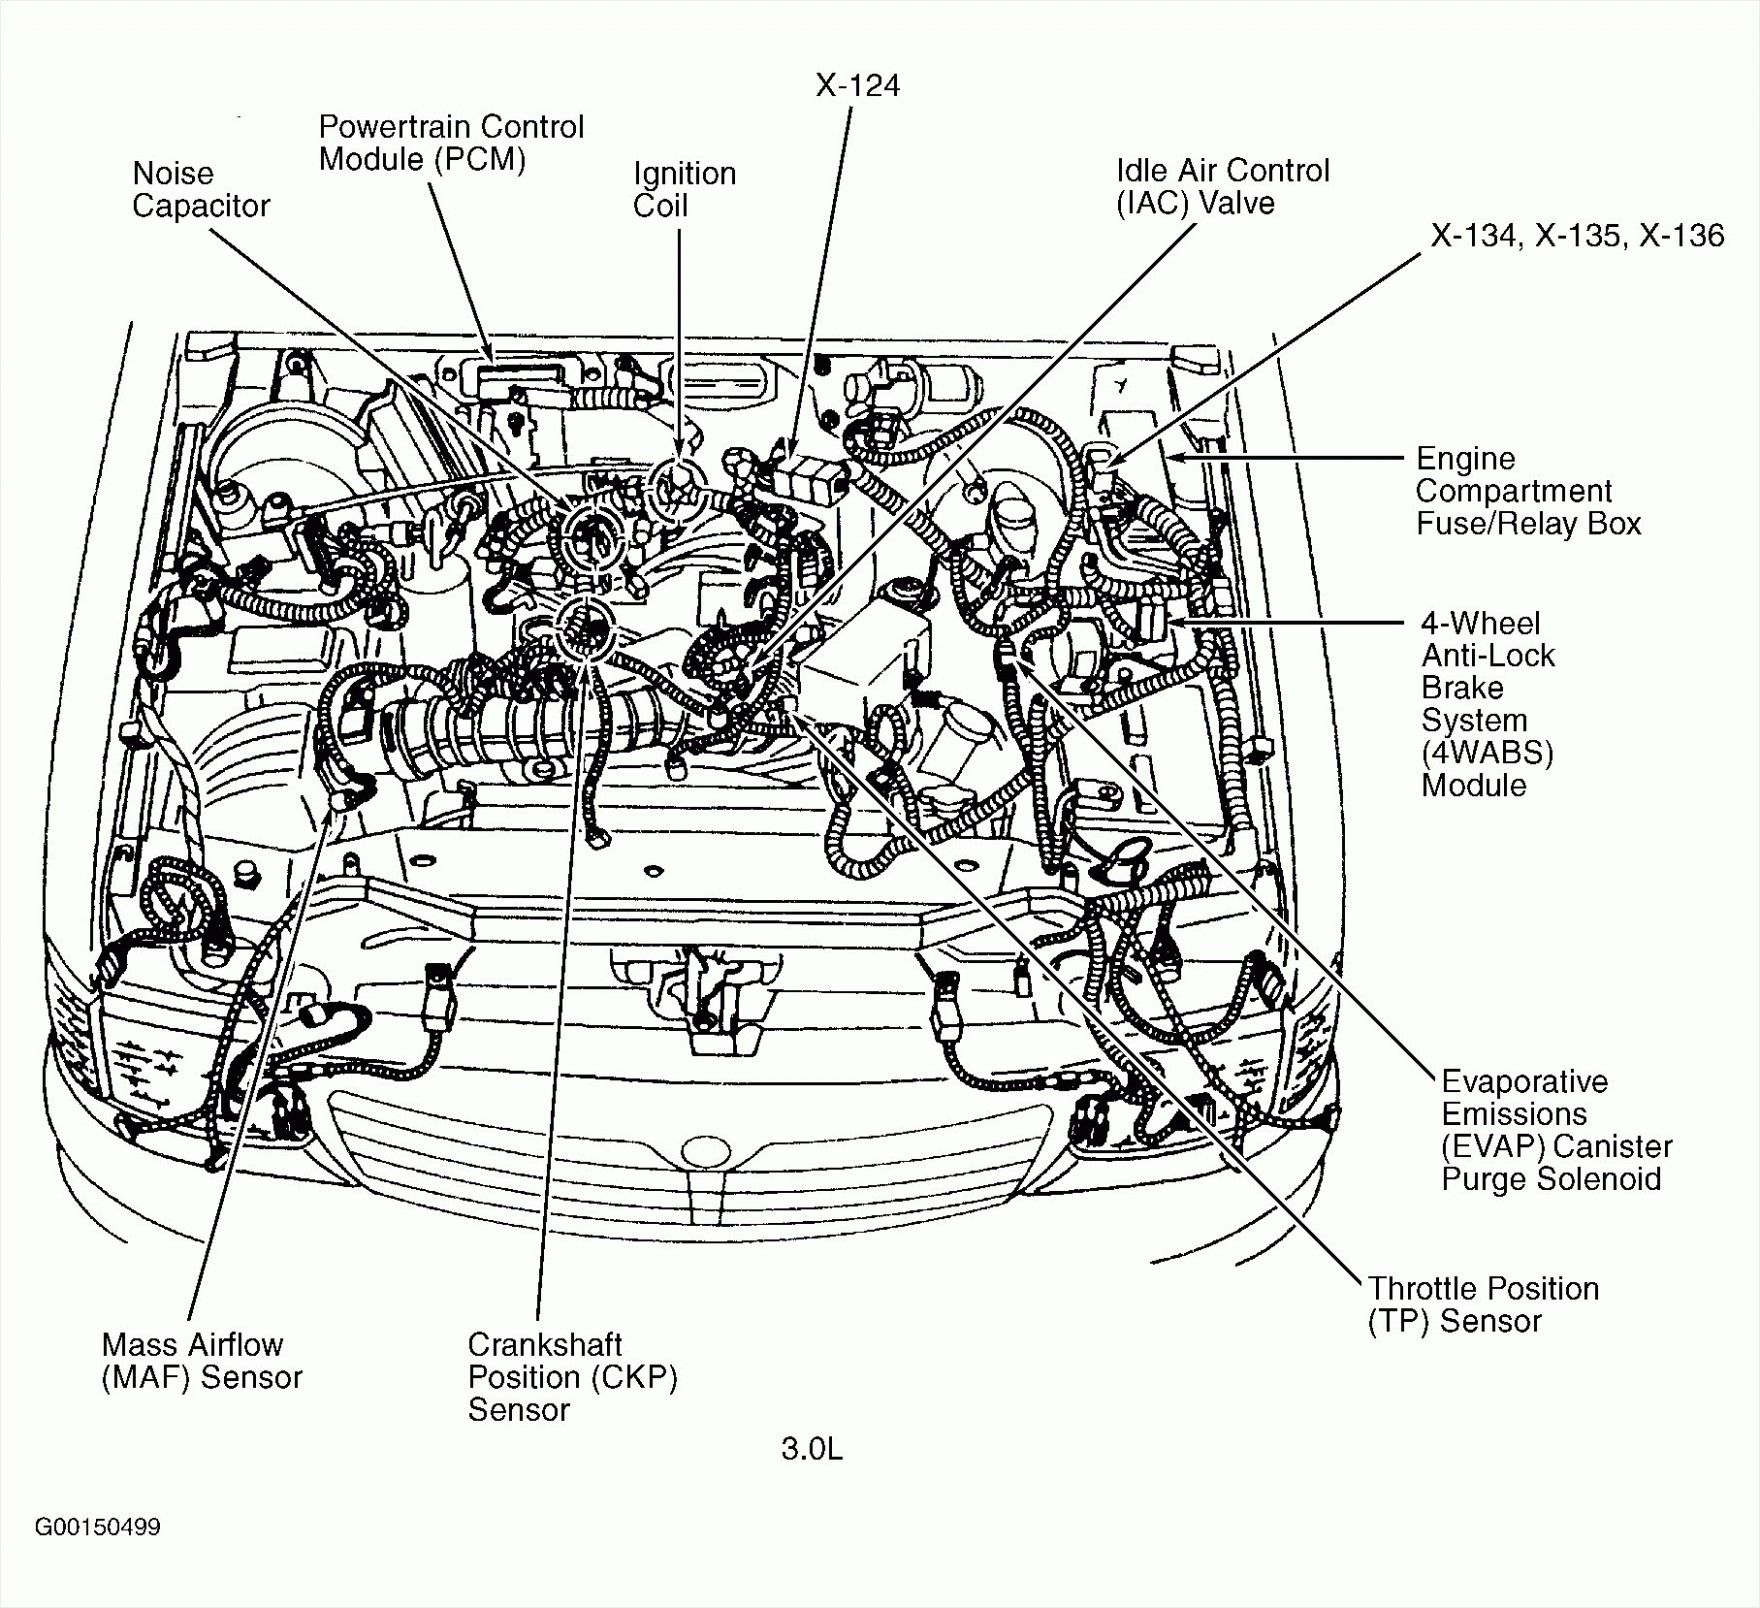 Pw7 Engine Diagram Adalah Pw7 Engine Diagram Adalah